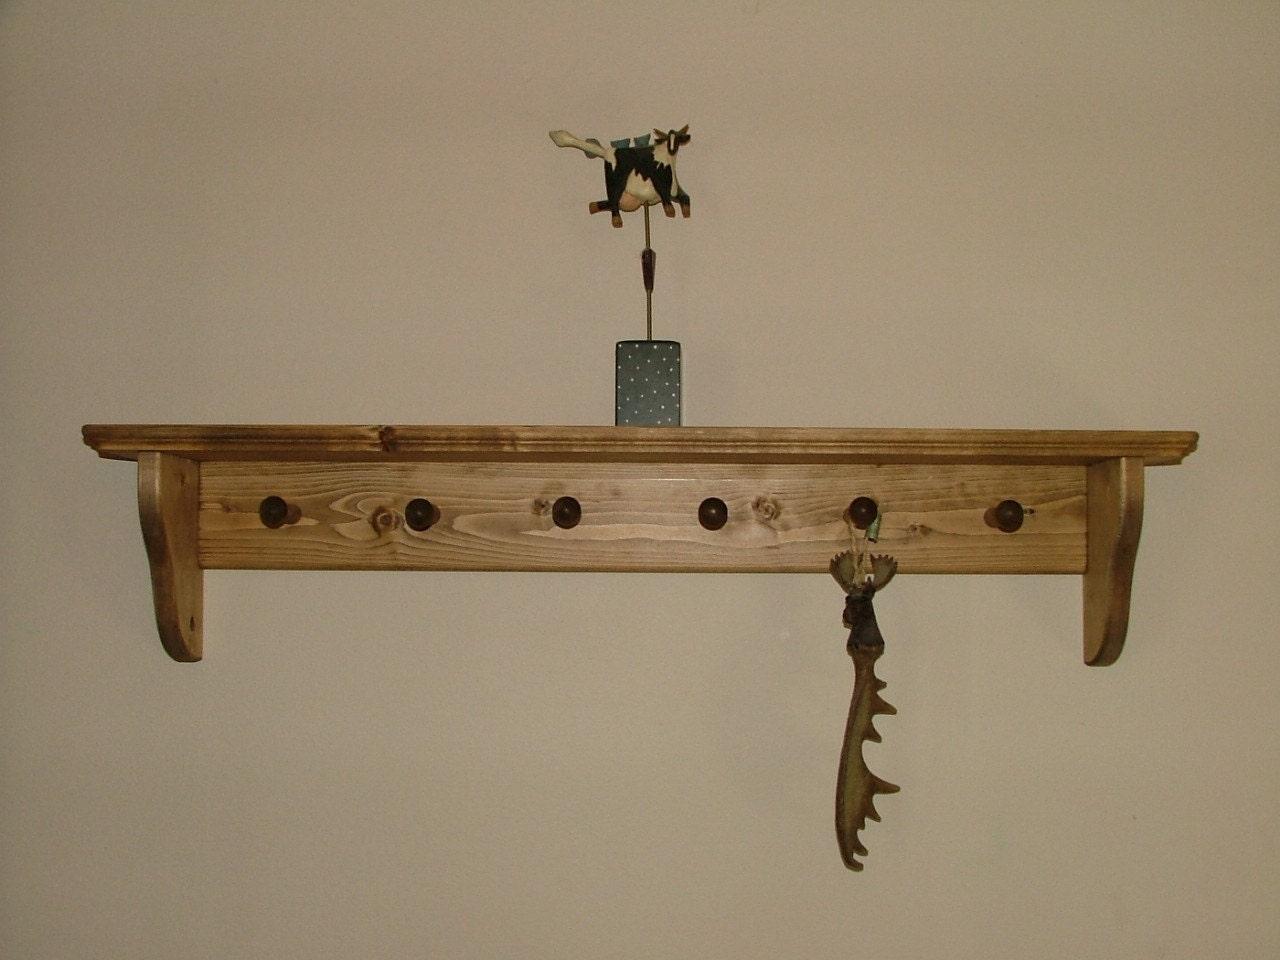 Wall Mounted Coat Shelf Shaker Peg Wall Shelf Coat Hanger